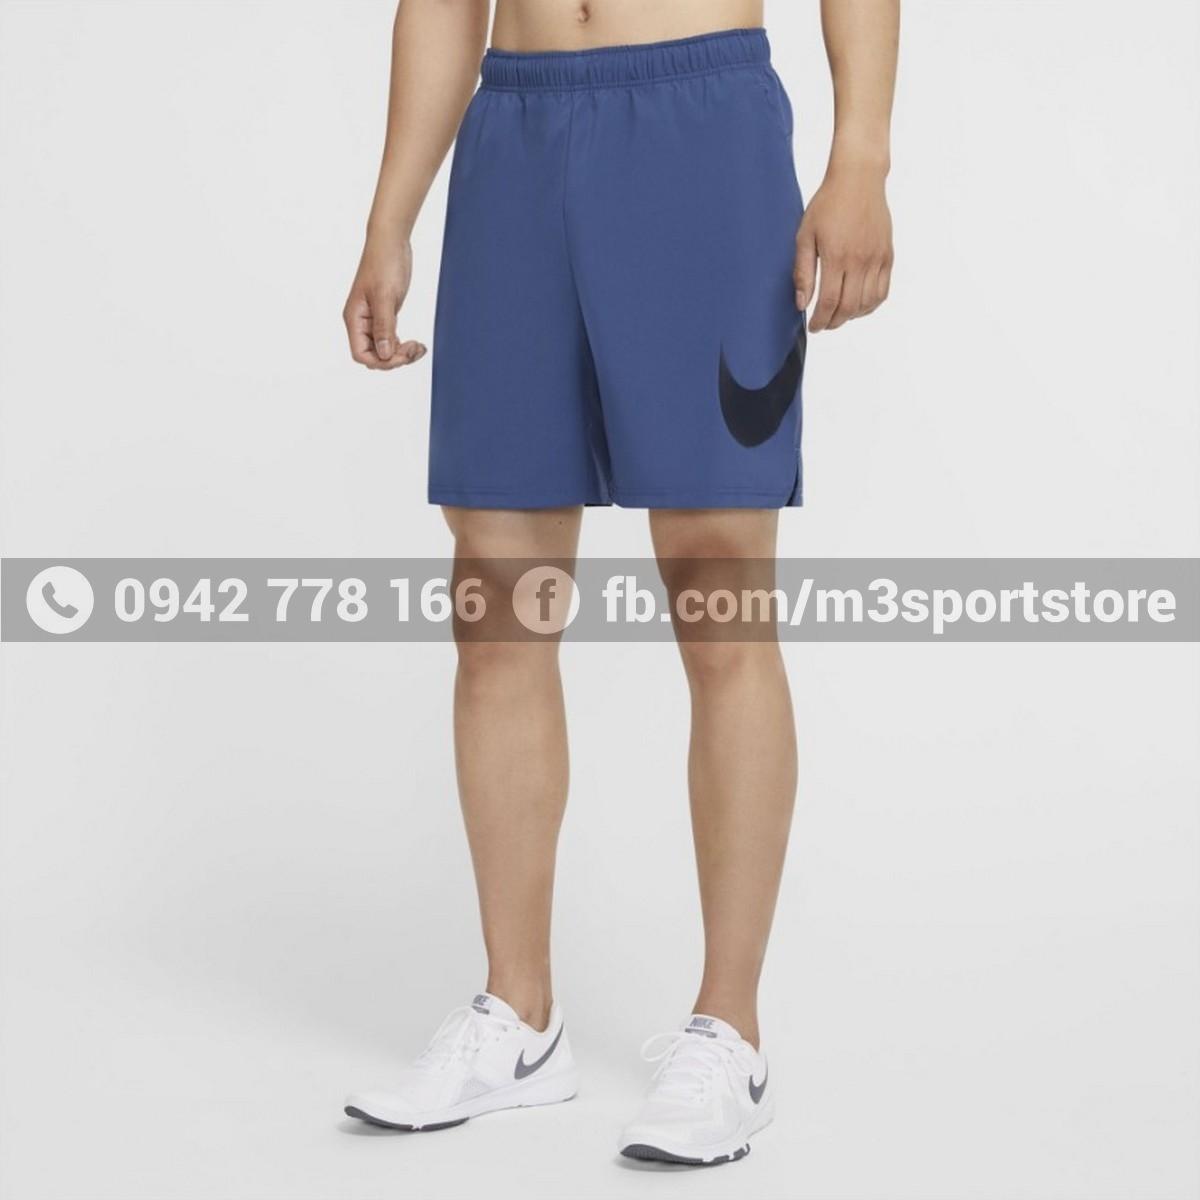 Quần short thể thao nam Nike Flex Men's Woven CZ6371